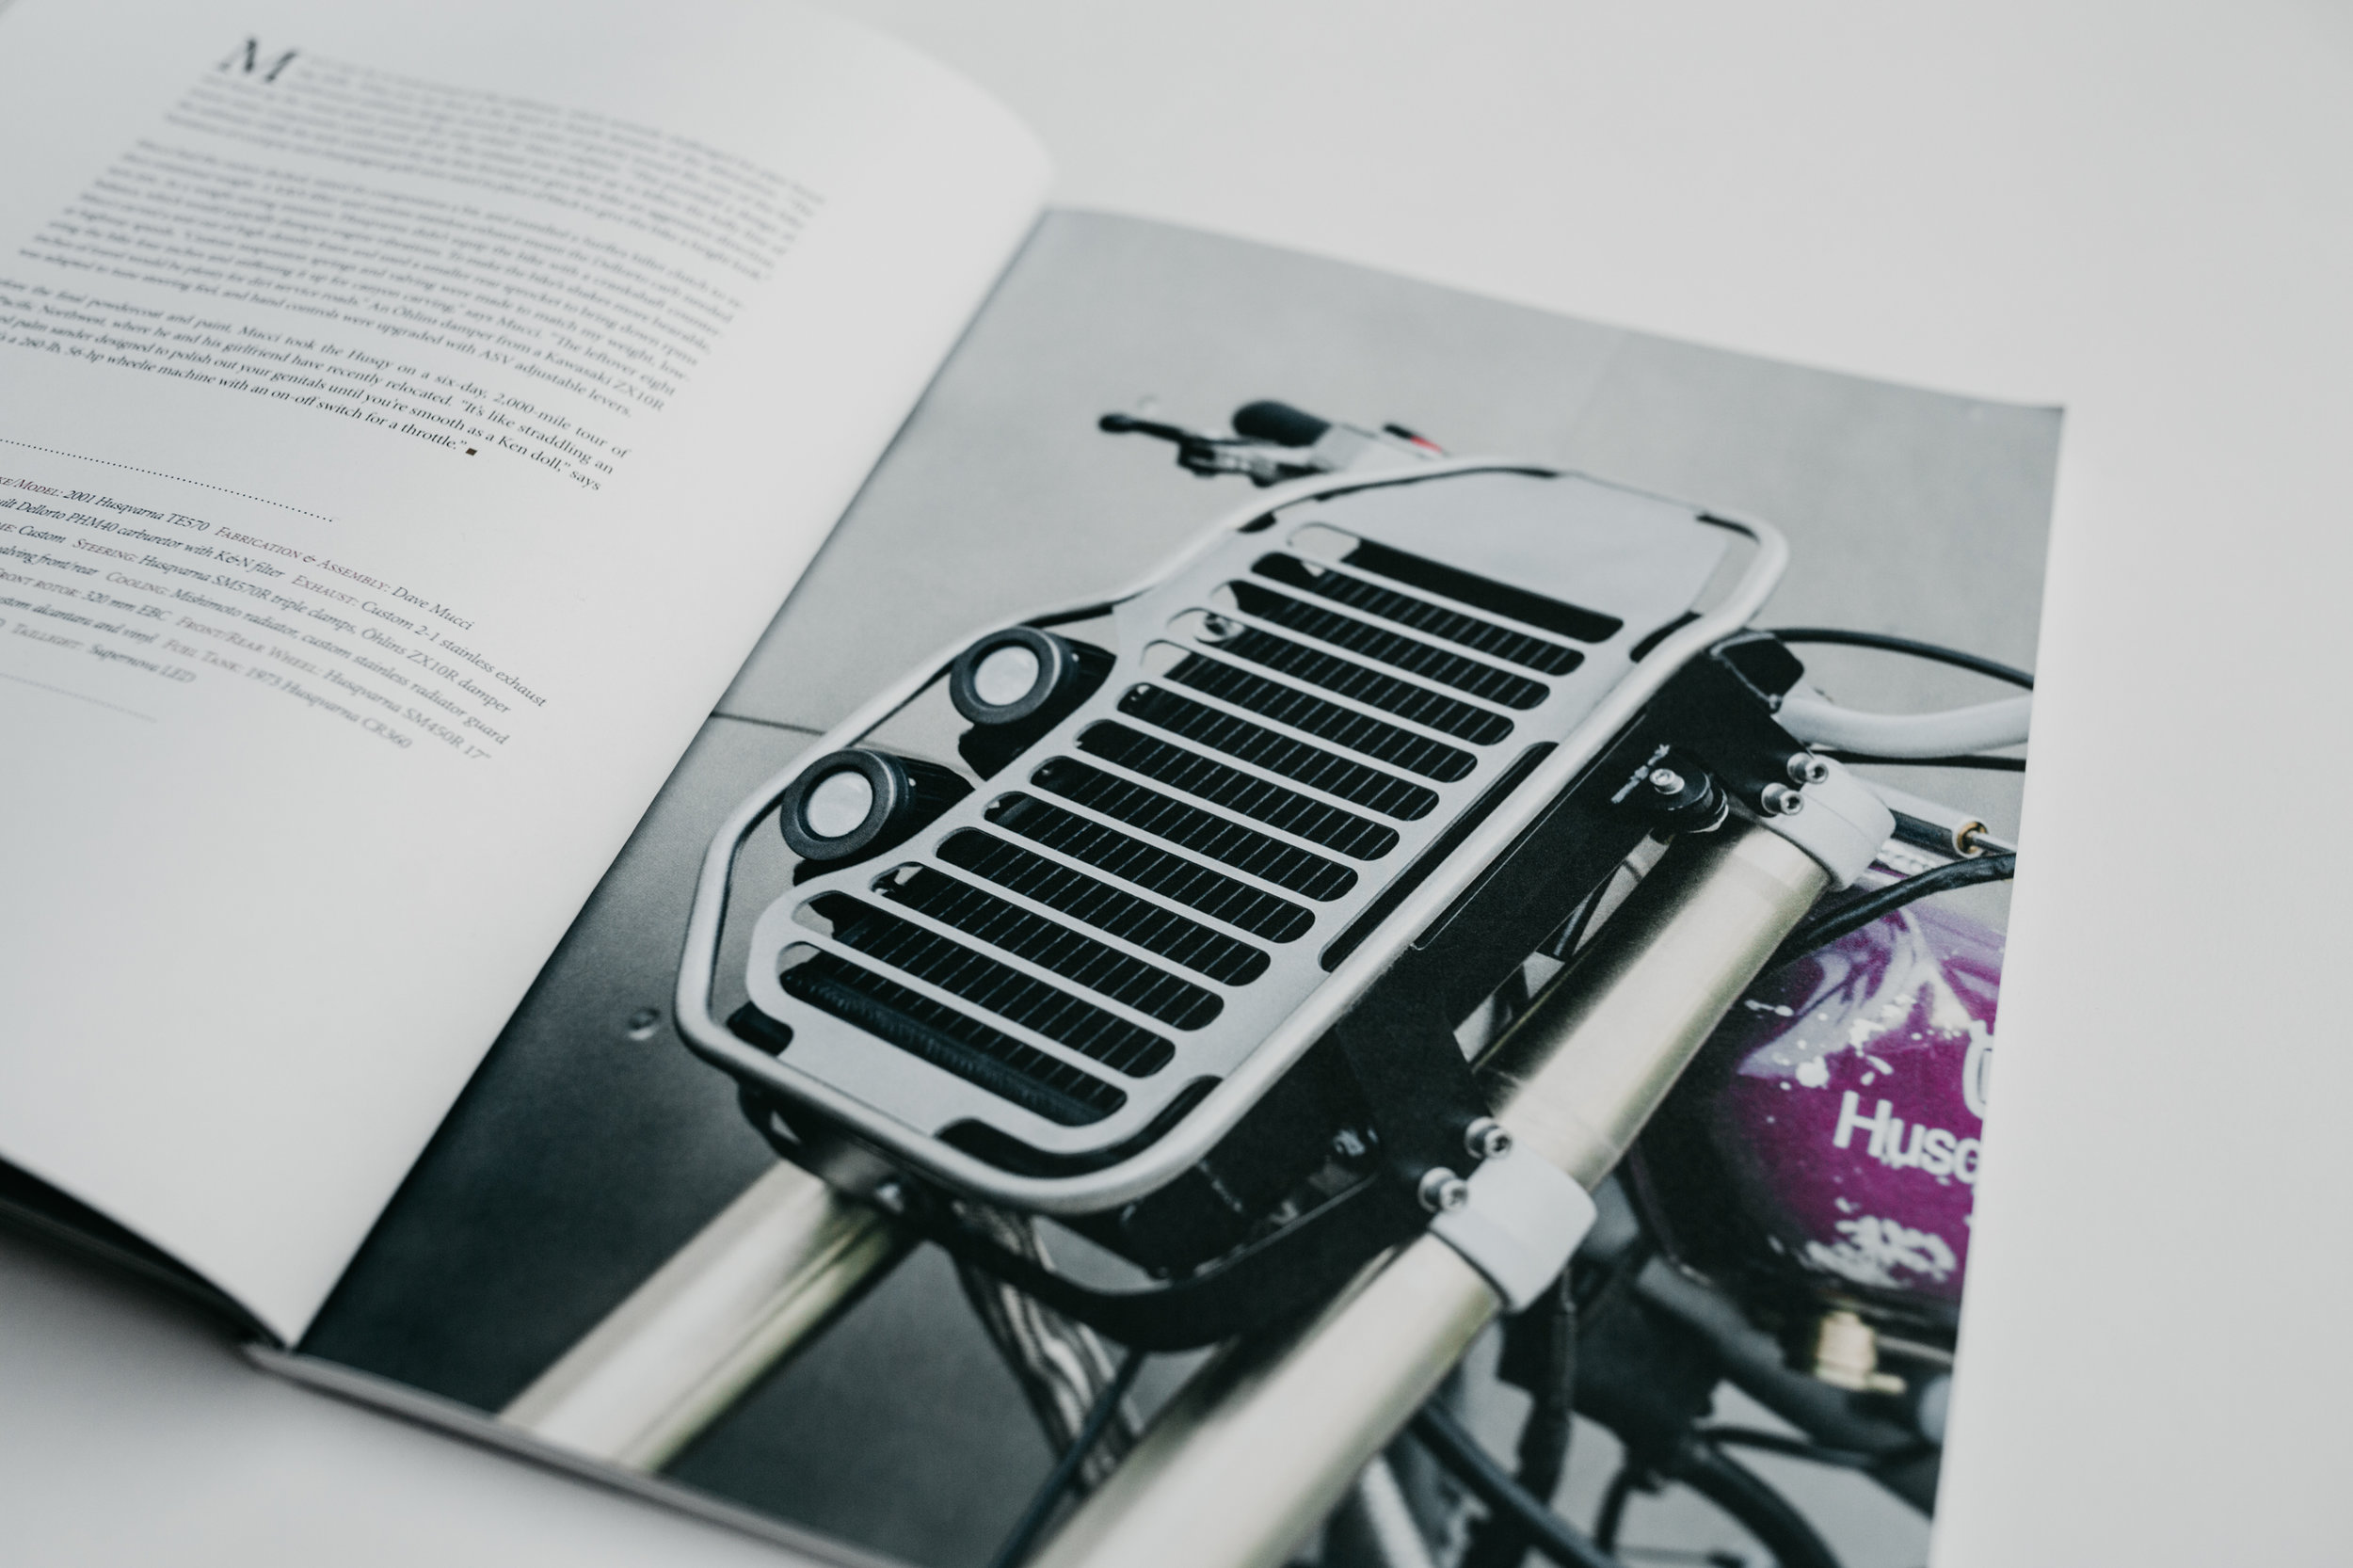 Iron&Air_Issue27_Moto-Mucci_Husqvarna (4).JPG